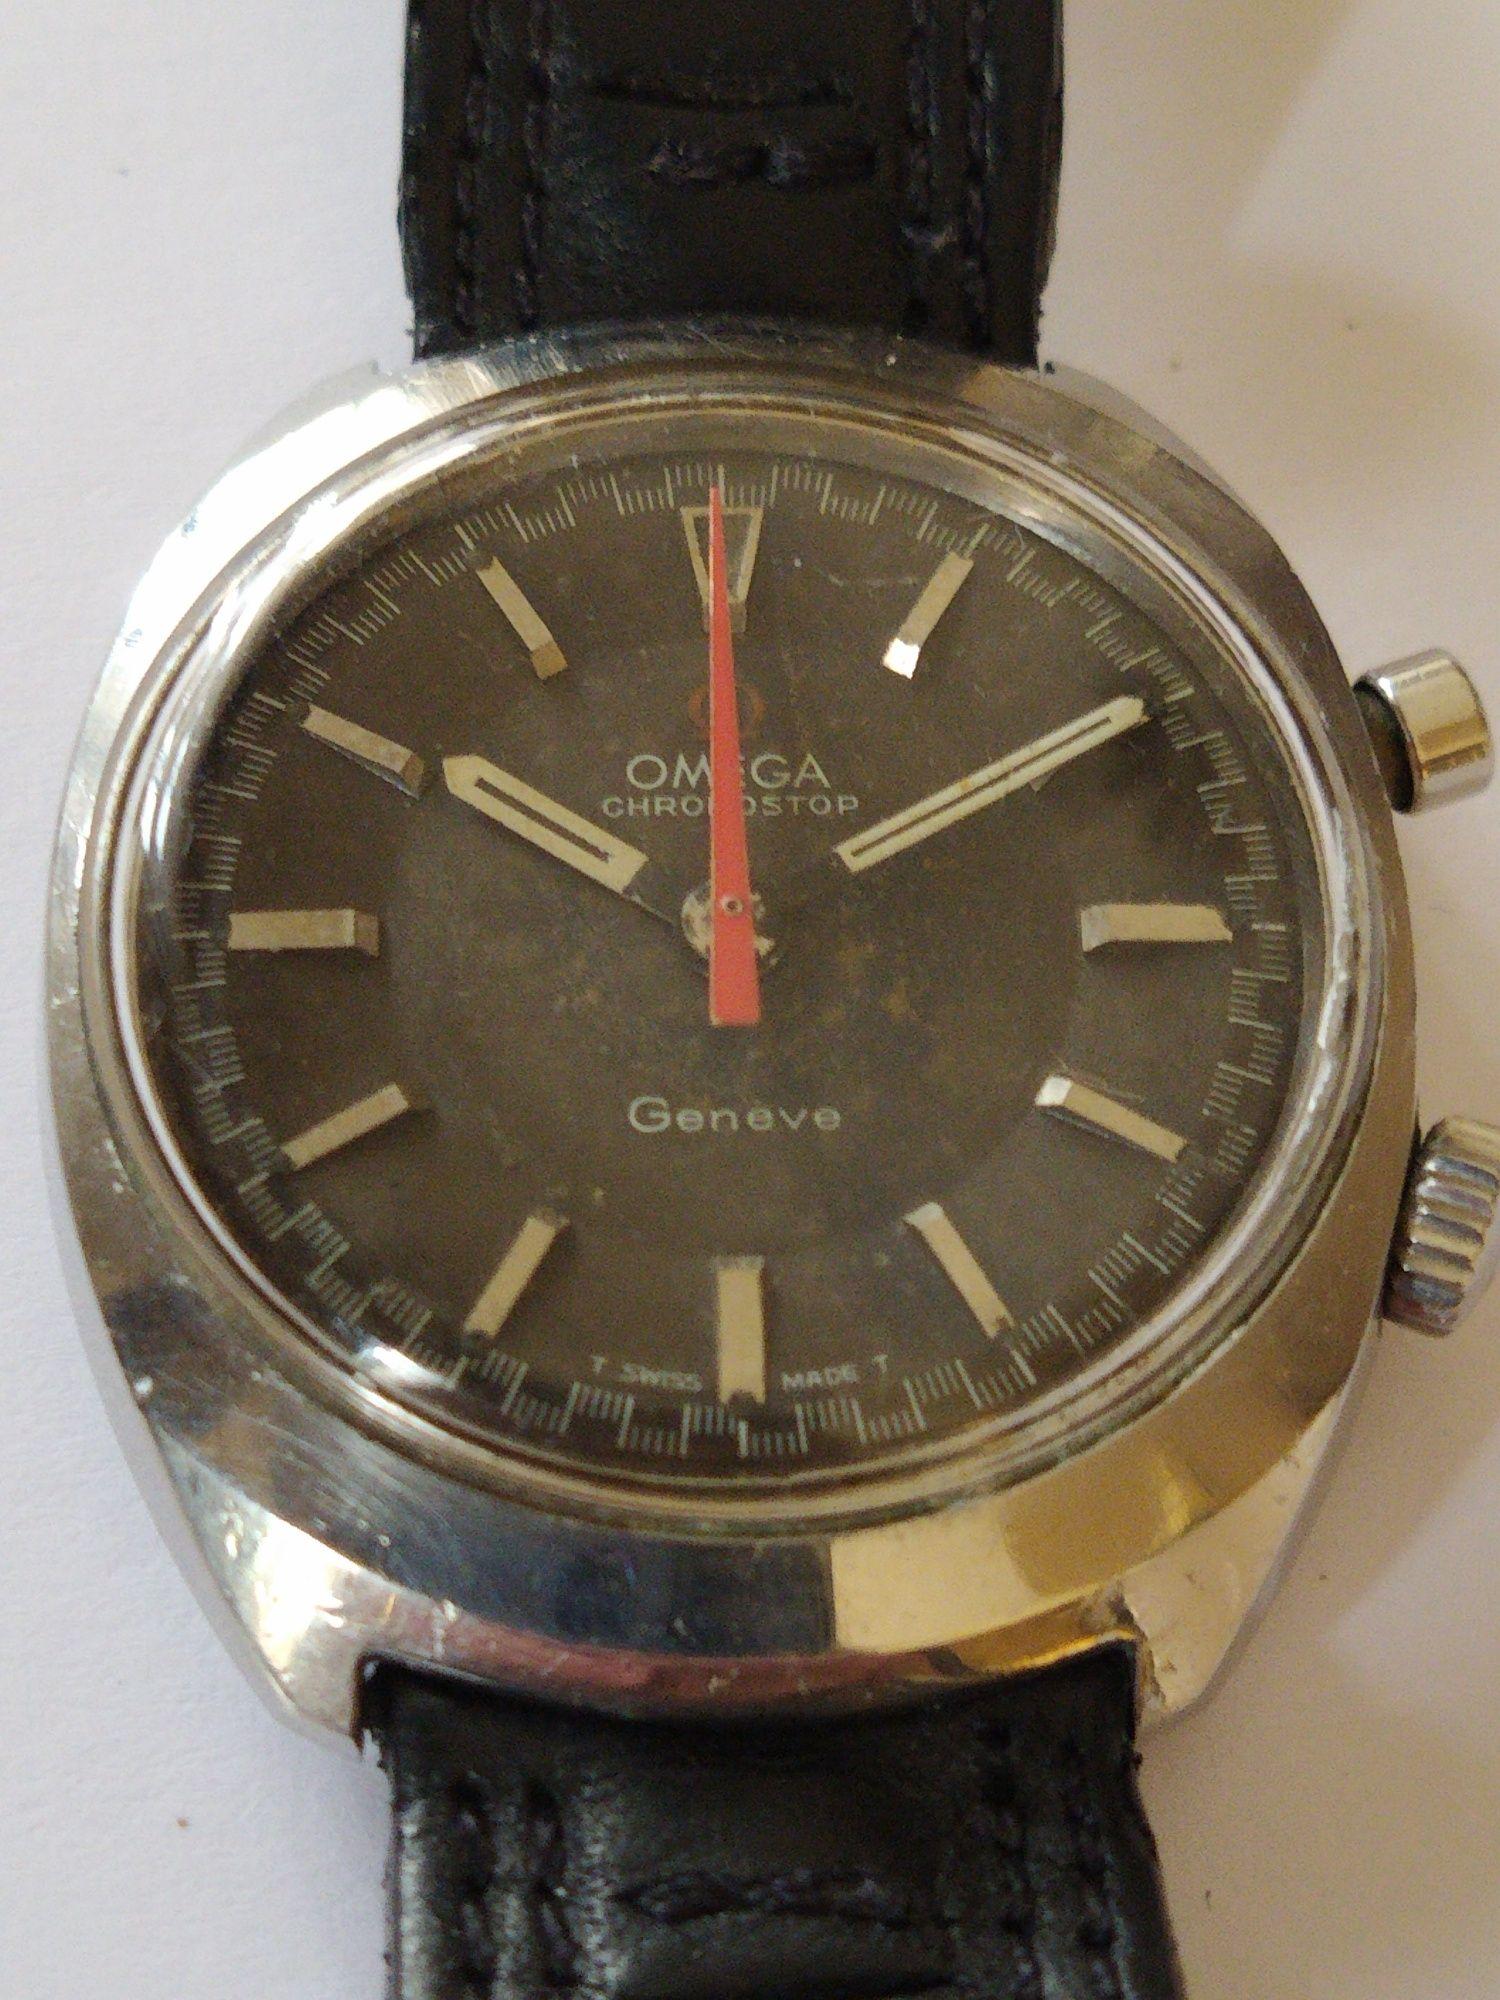 Relógio Omega Cronostop